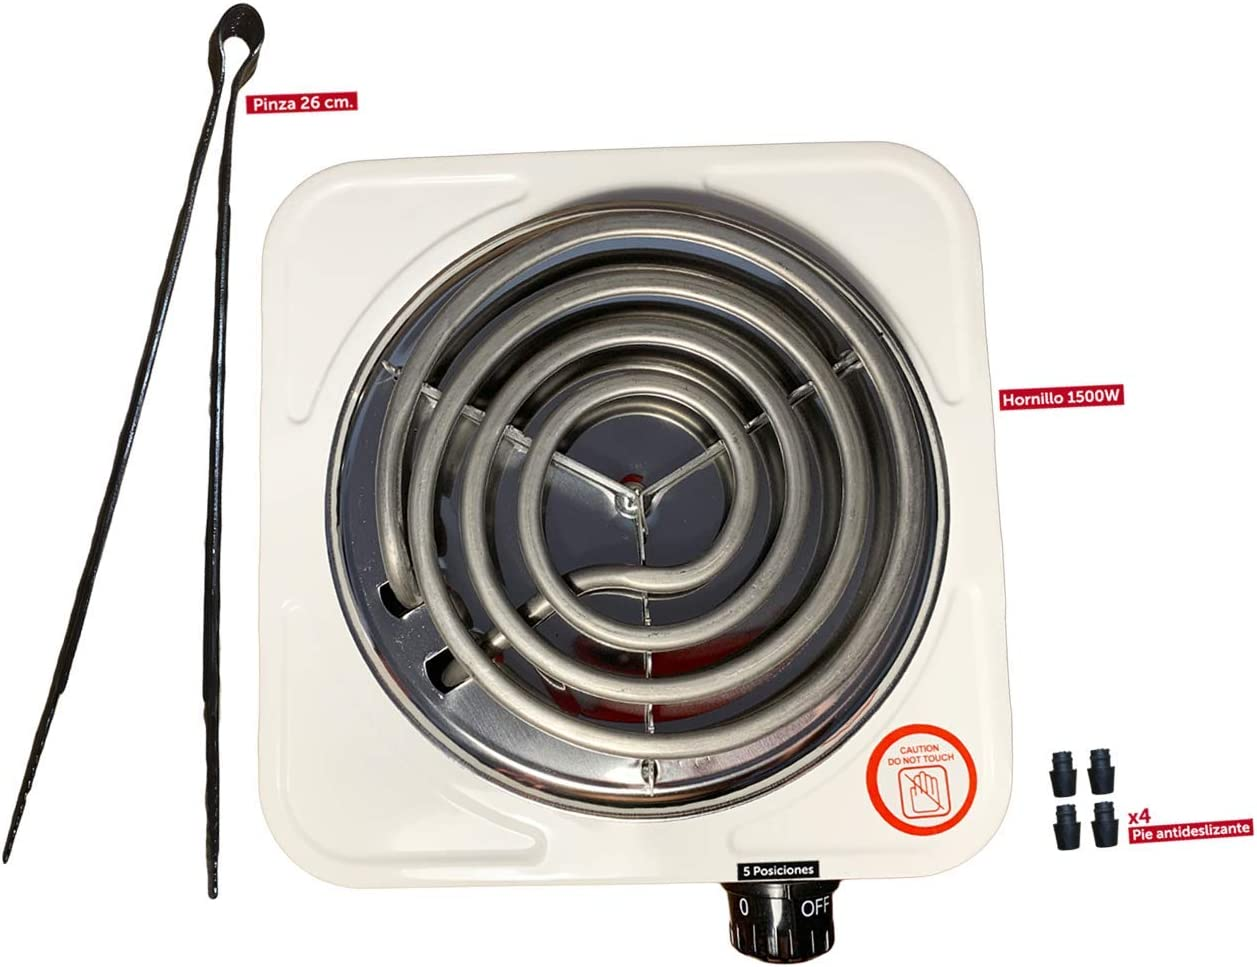 Hornillo eléctrico portátil para Cachimba - Shisha - Hookah | Cocina | Camping. 1500 W de Potencia. Incluye Pinzas para carbones de 26 cm.